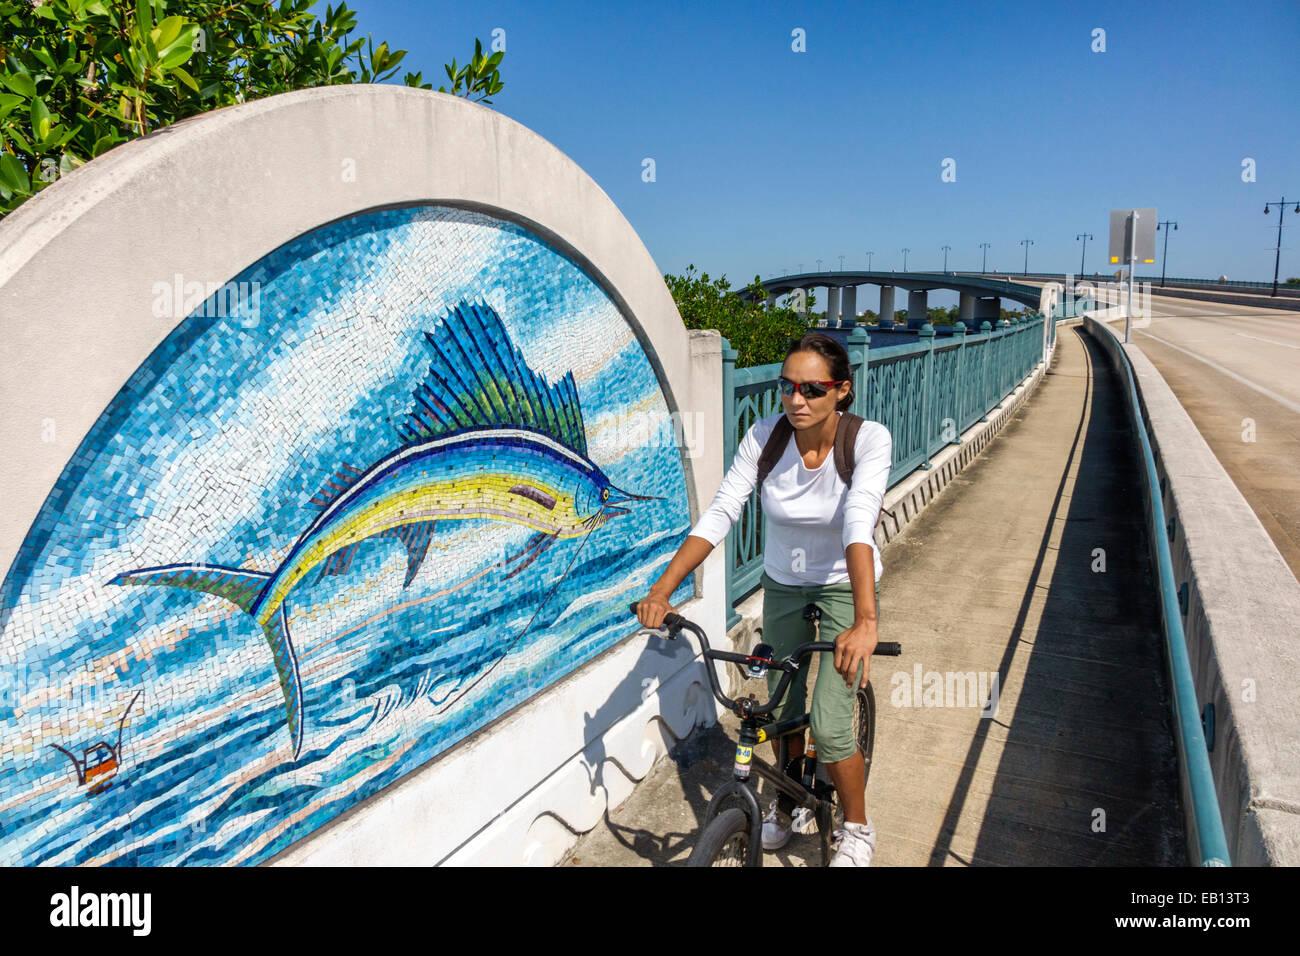 https www alamy com stock photo florida fl south daytona beach broadway bridge halifax river art mosaic 75627667 html